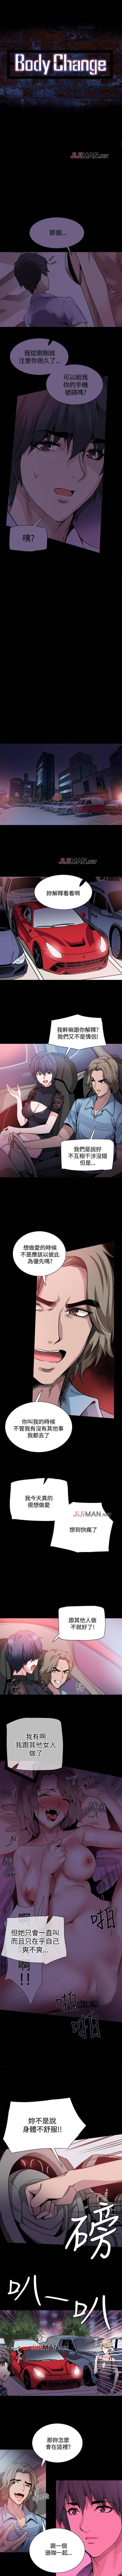 【已完结】Bodychange(作者:Seize & 死亡節奏) 第1~33话 62